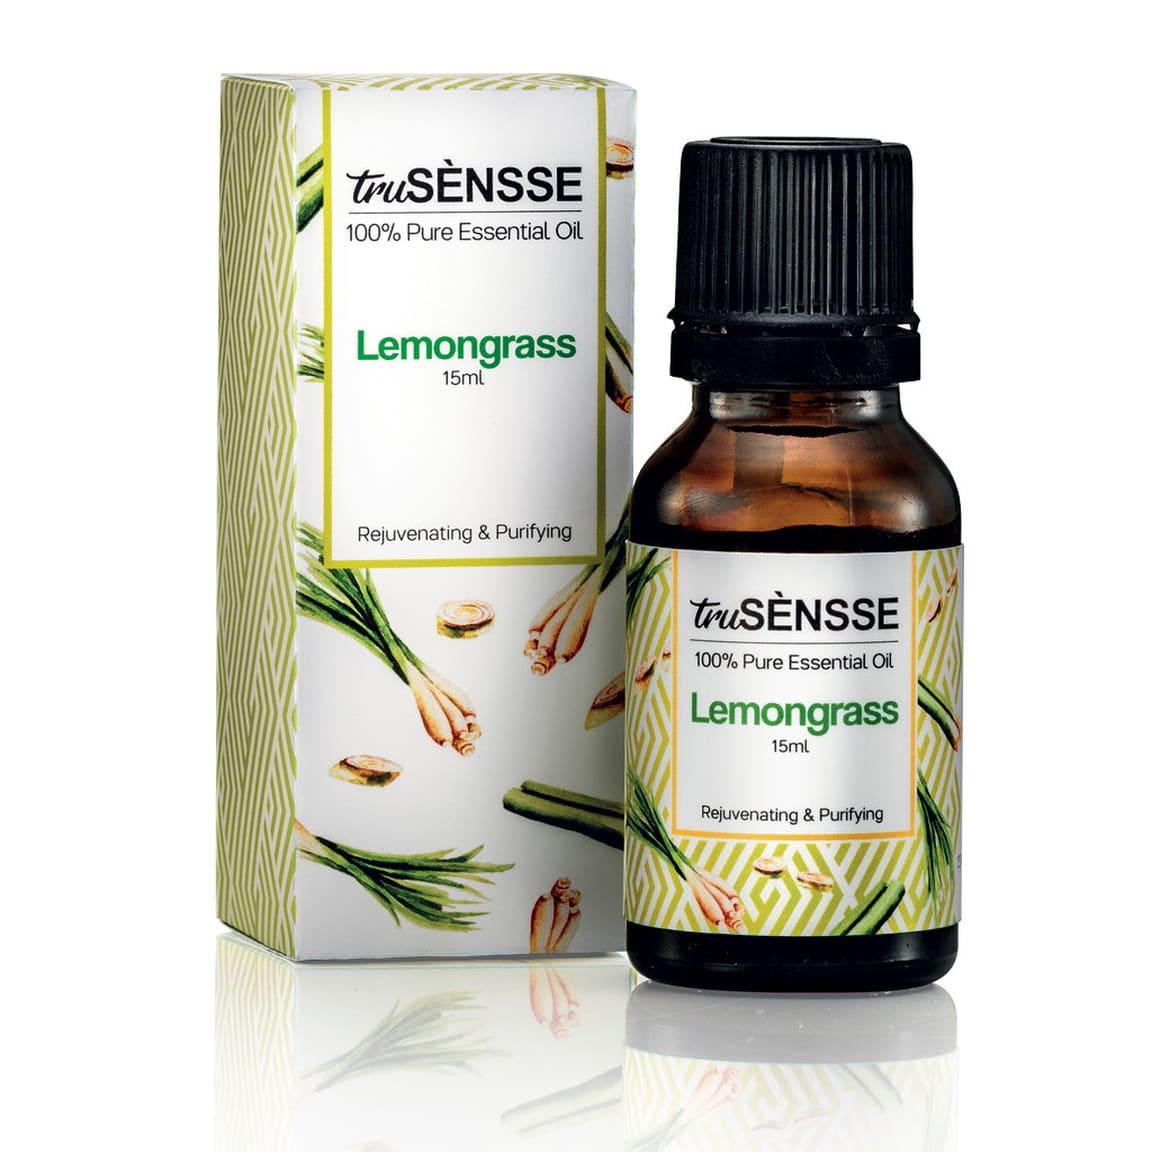 truSÈNSSE 100% Pure Essential Oil - Lemongrass (1) 15ml